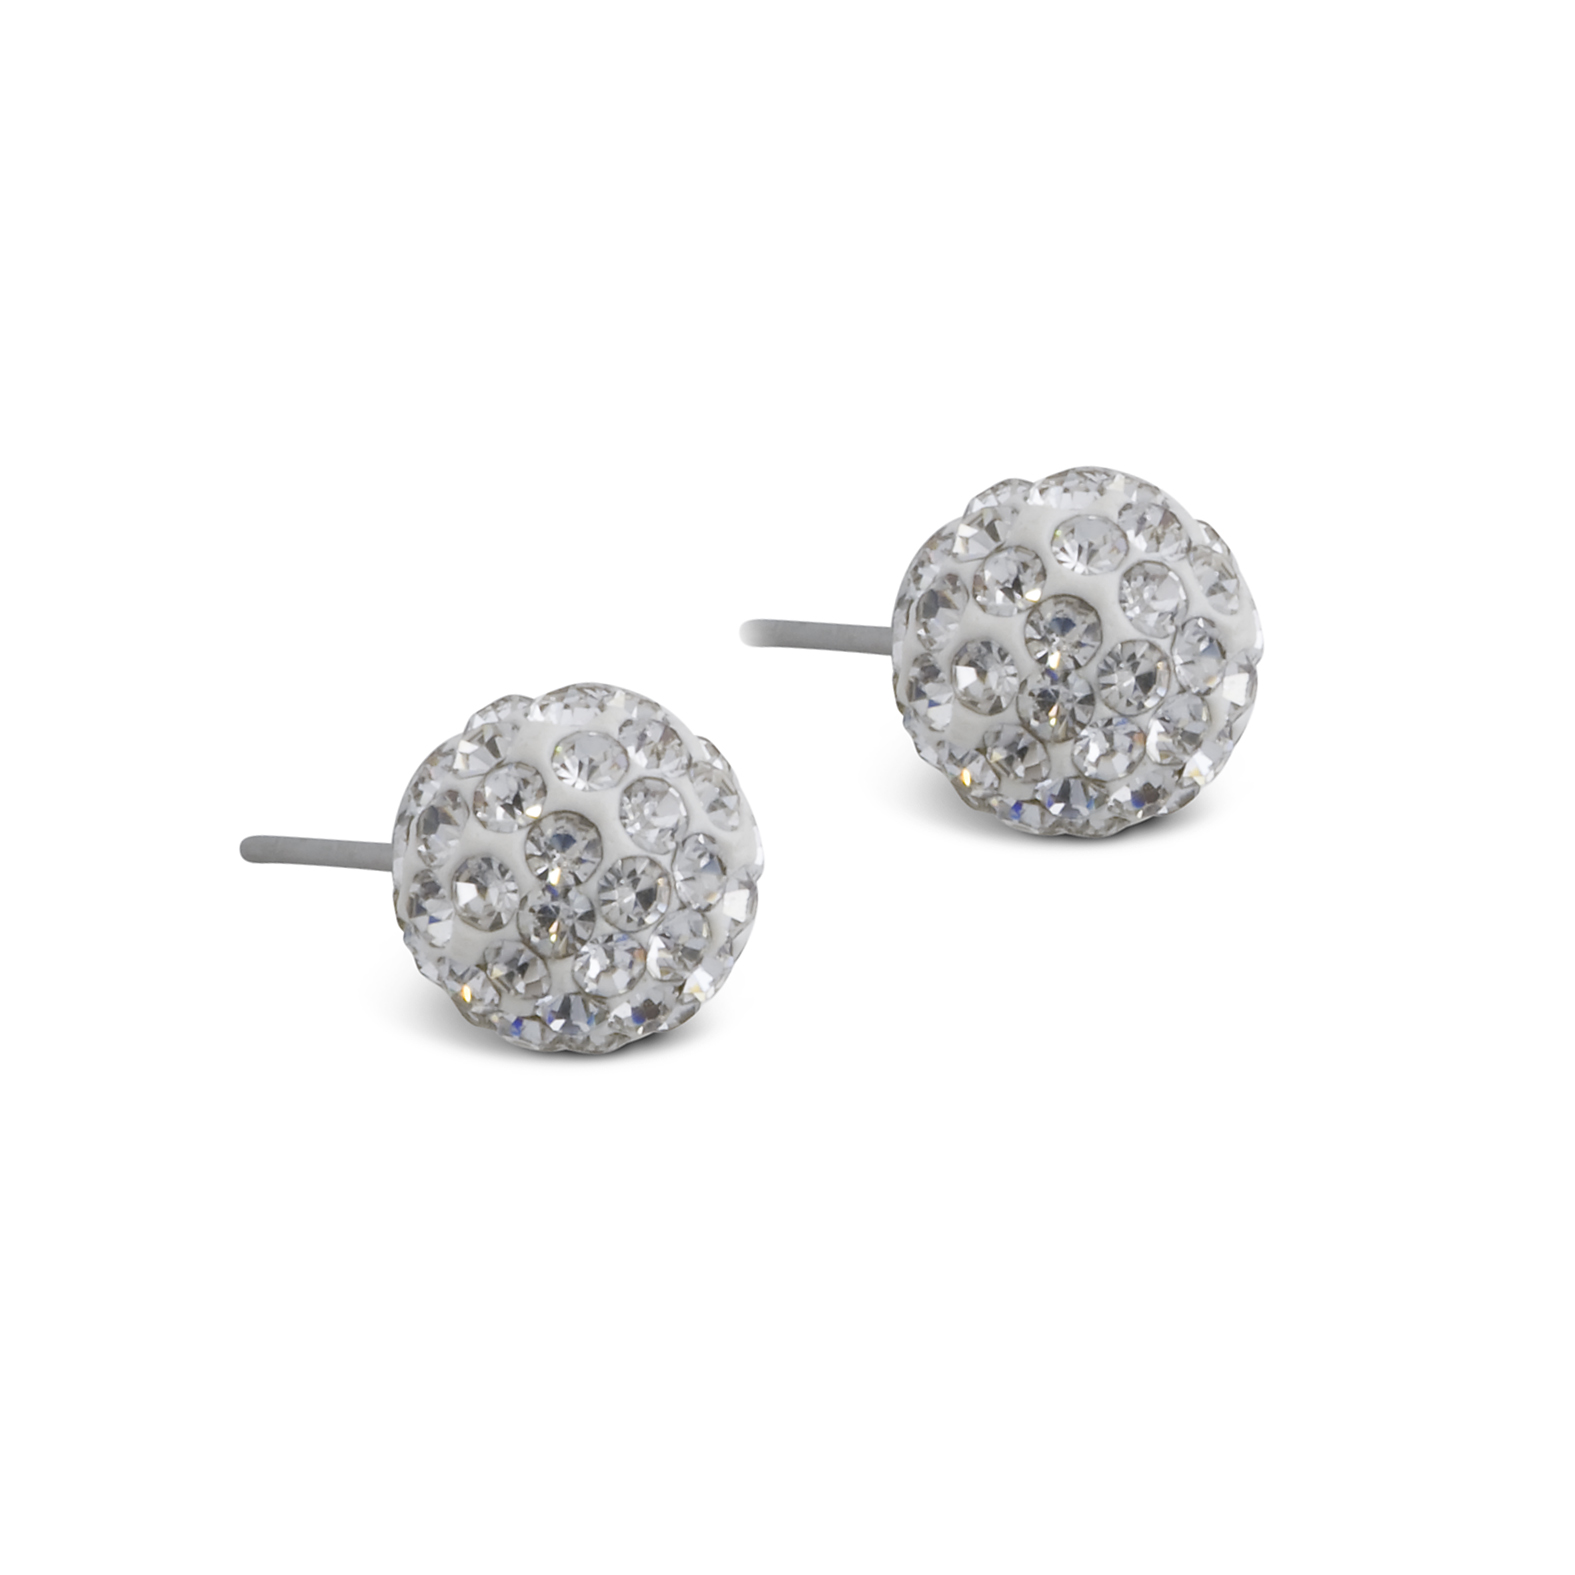 Damsmycke pfg Stockholm Pearls for Girls-Thea Earring 4577-00